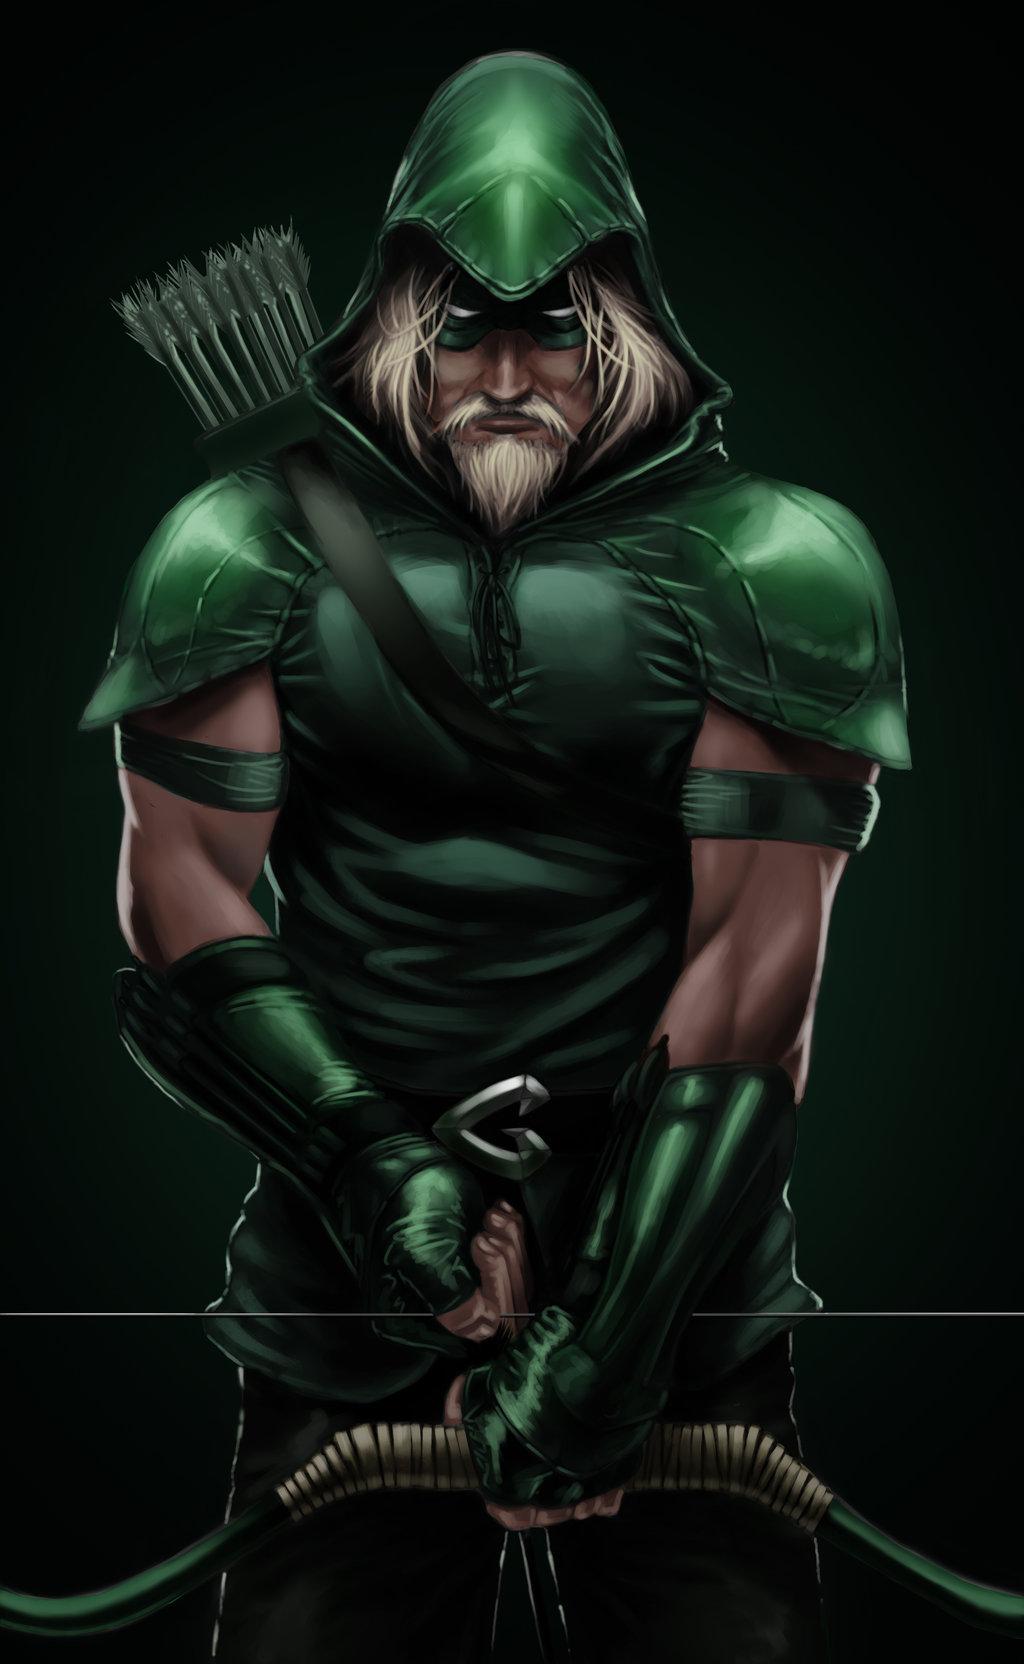 Deadpool & Moon Knight VS Green Arrow Catwoman & Nightwing.